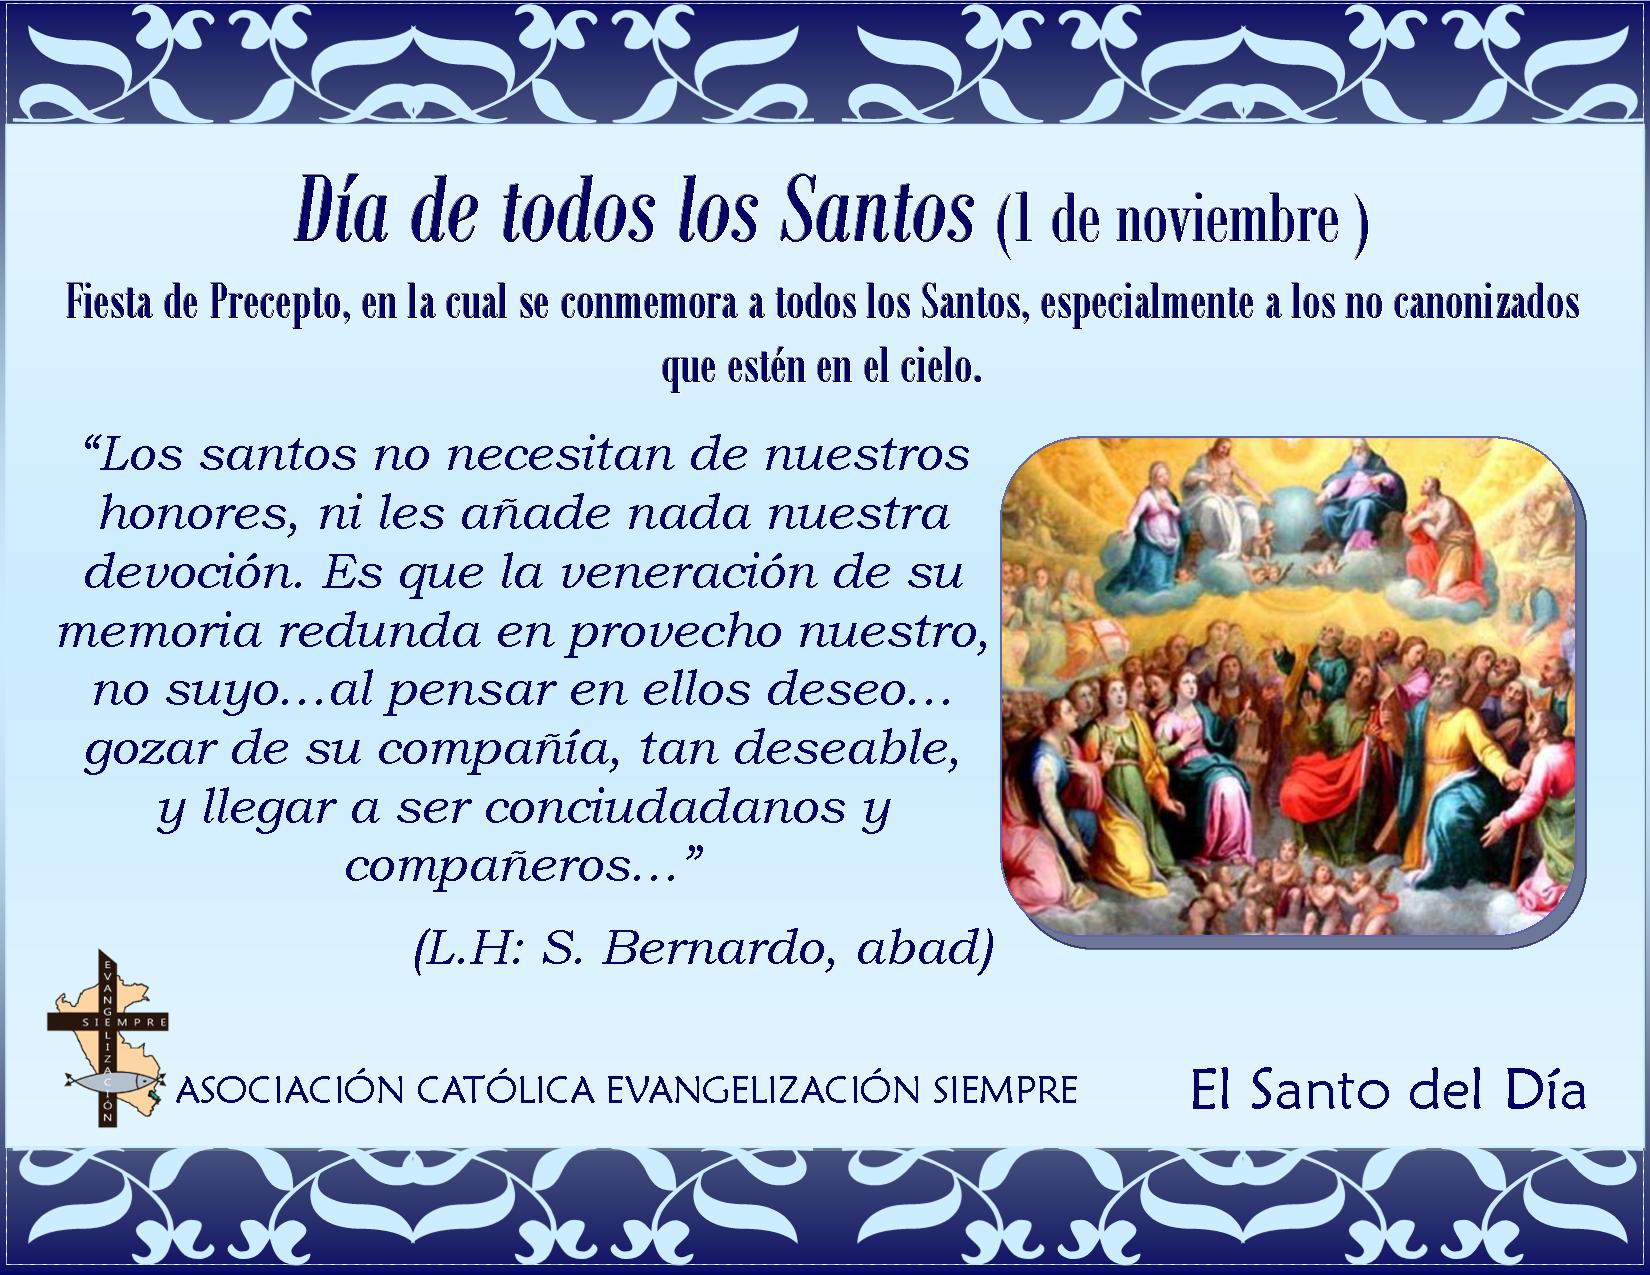 santo-del-dia-1-noviembre